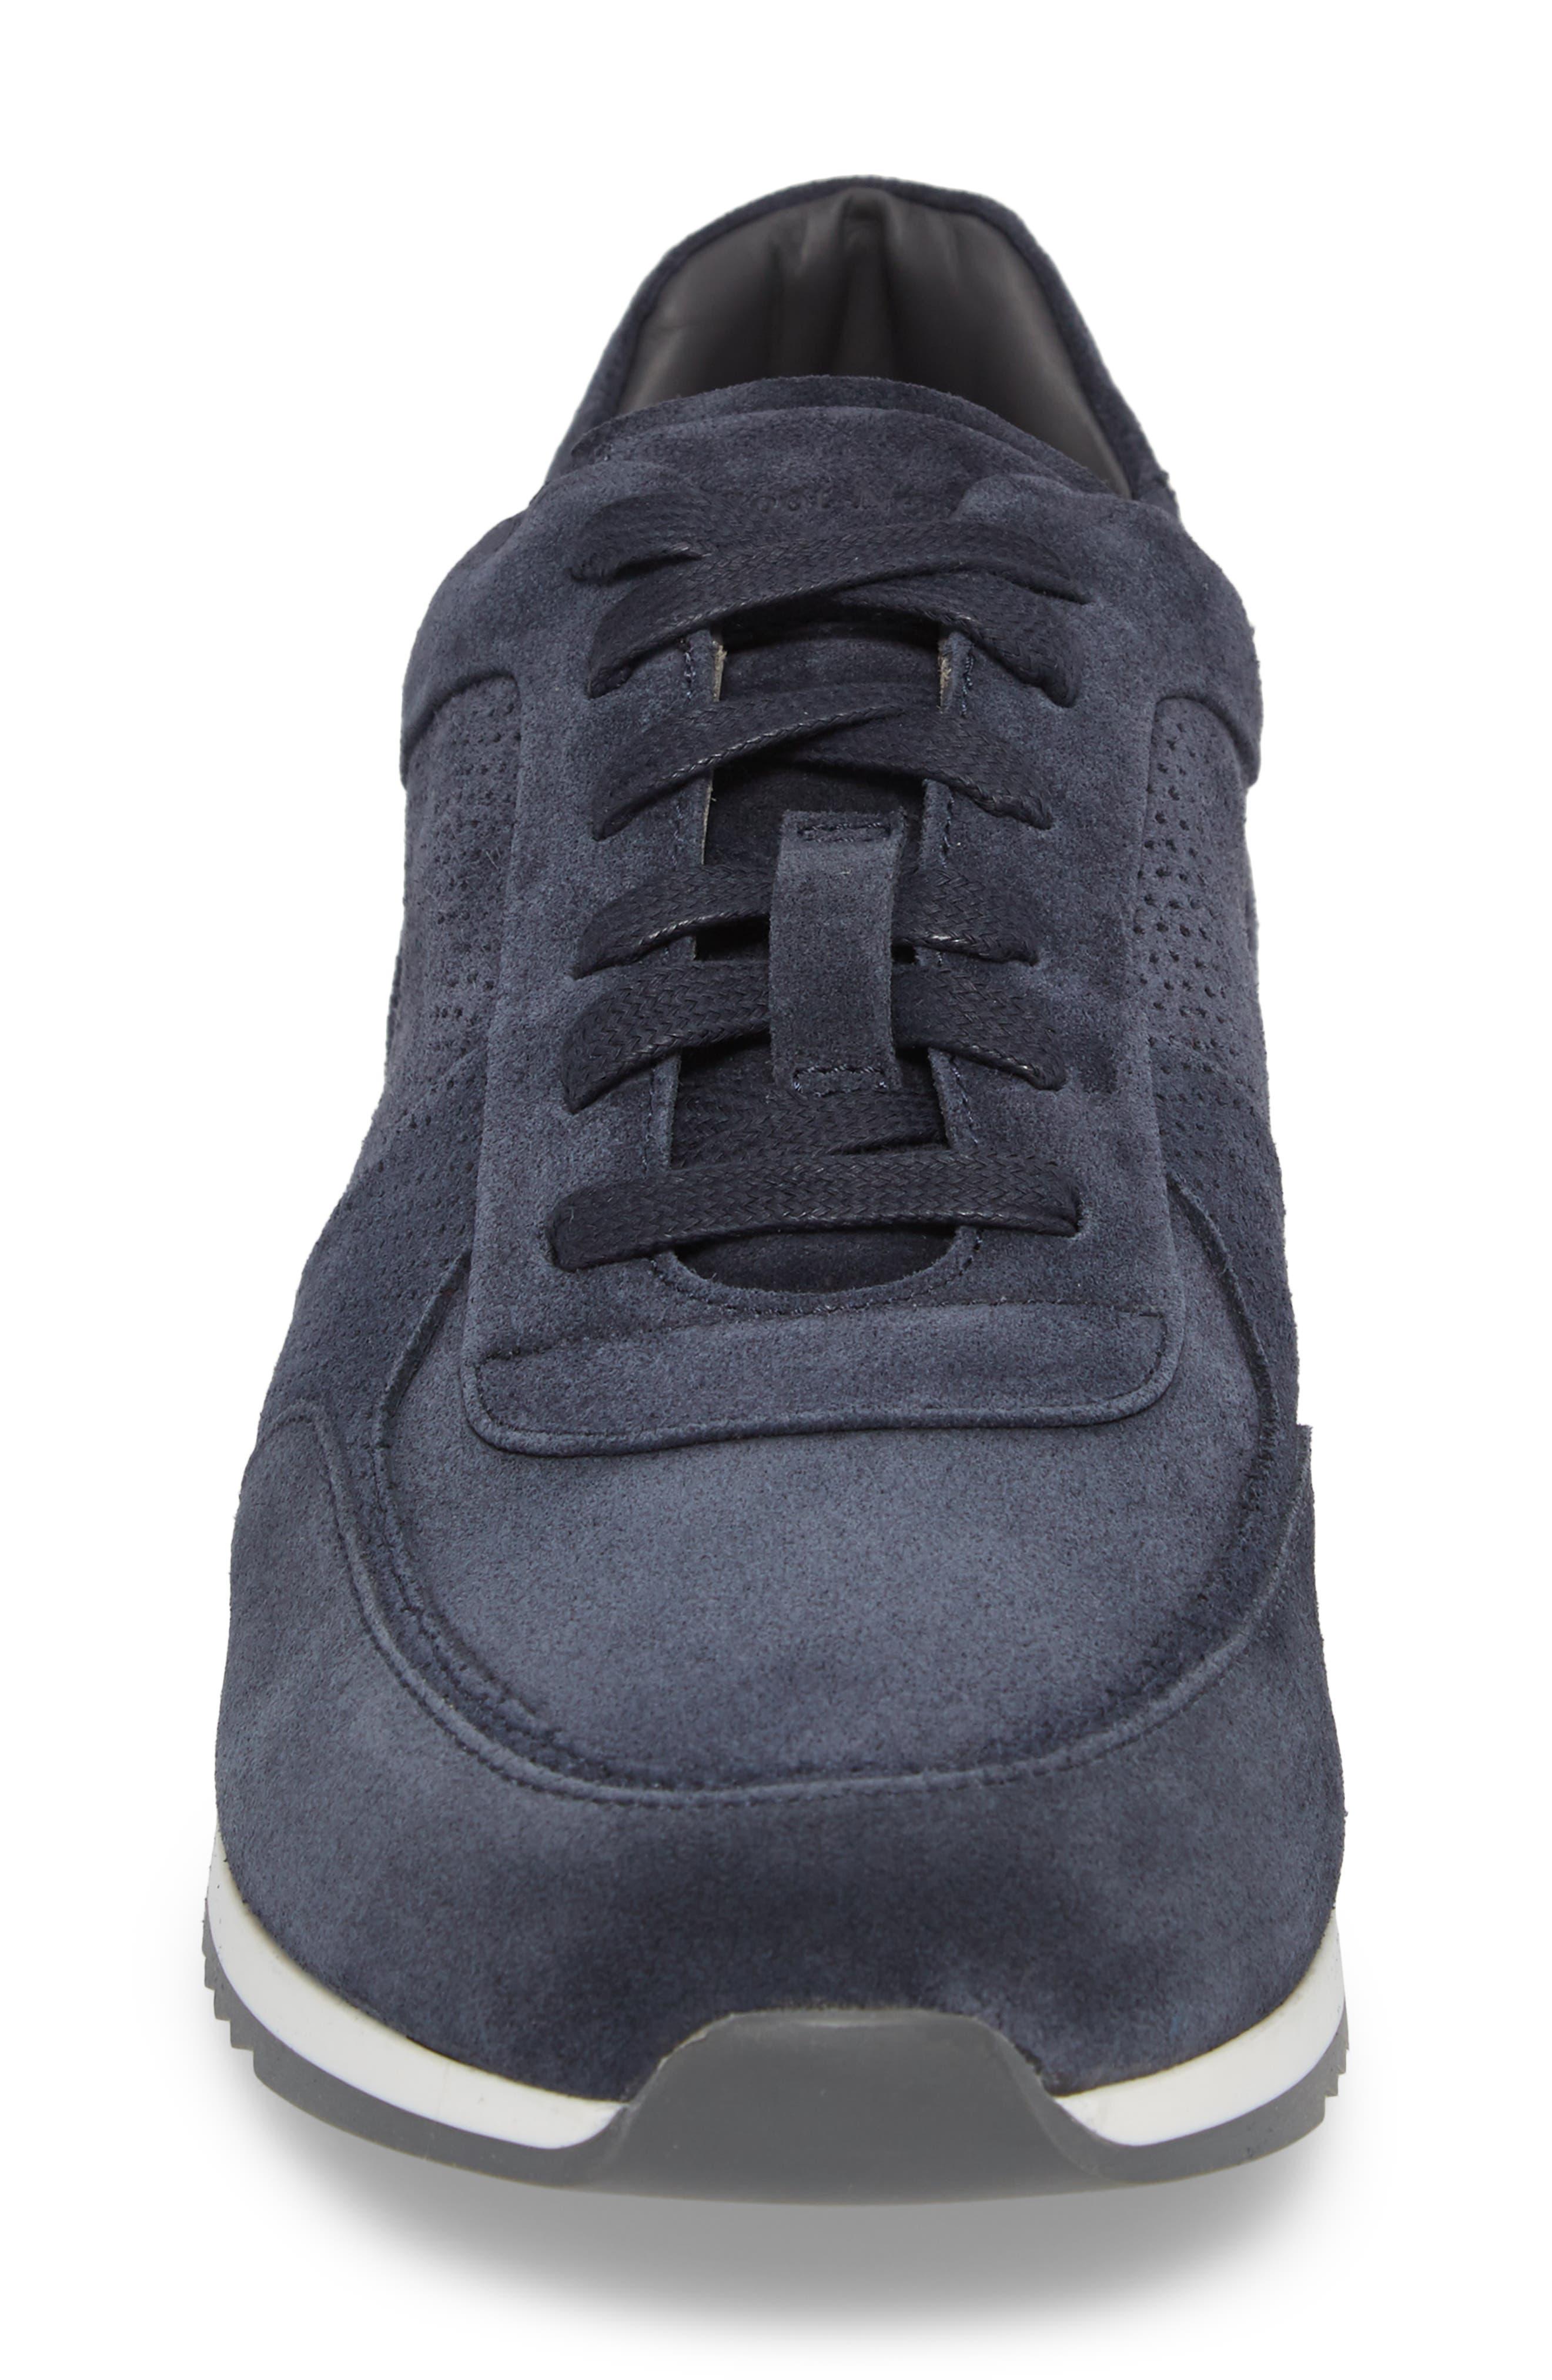 Fordham Low Top Sneaker,                             Alternate thumbnail 4, color,                             Space Blue Suede